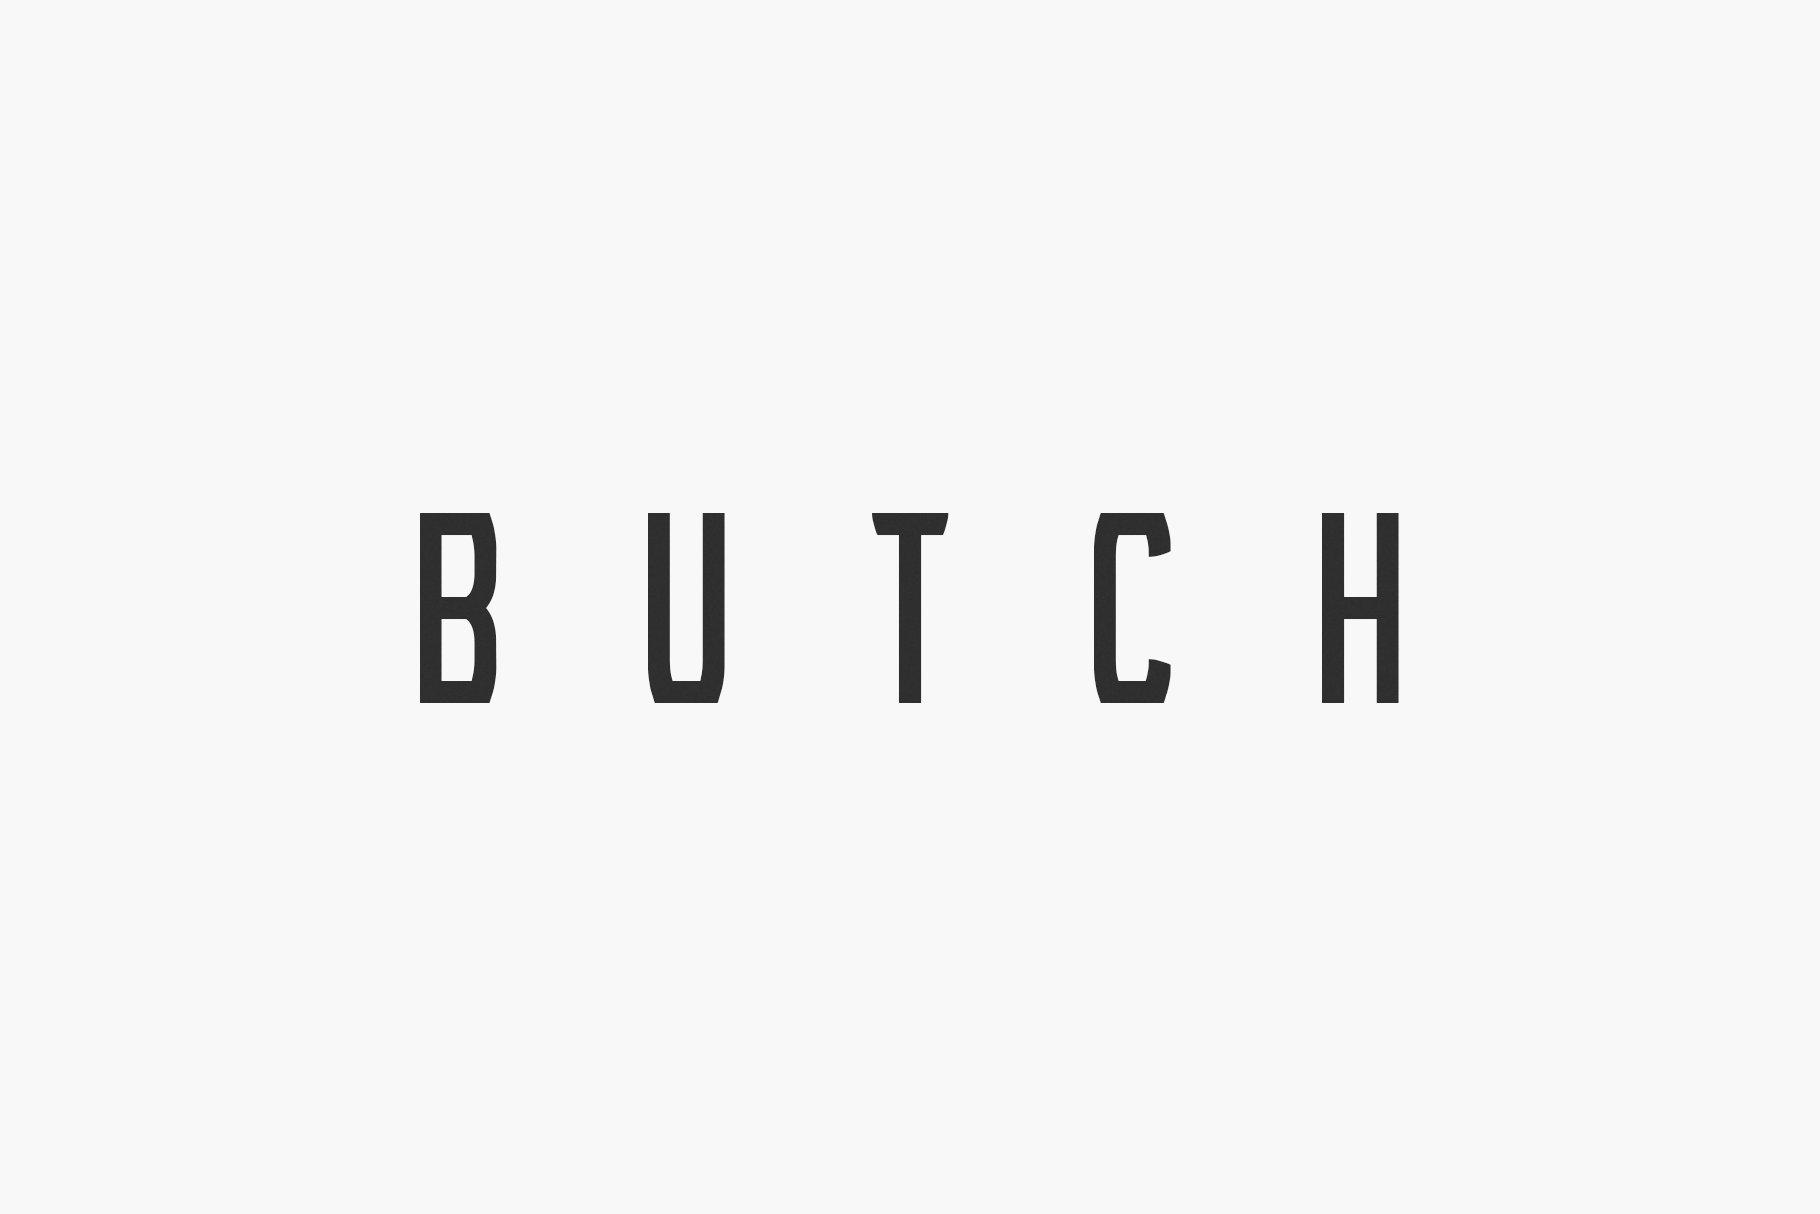 Butch display fonts creative market